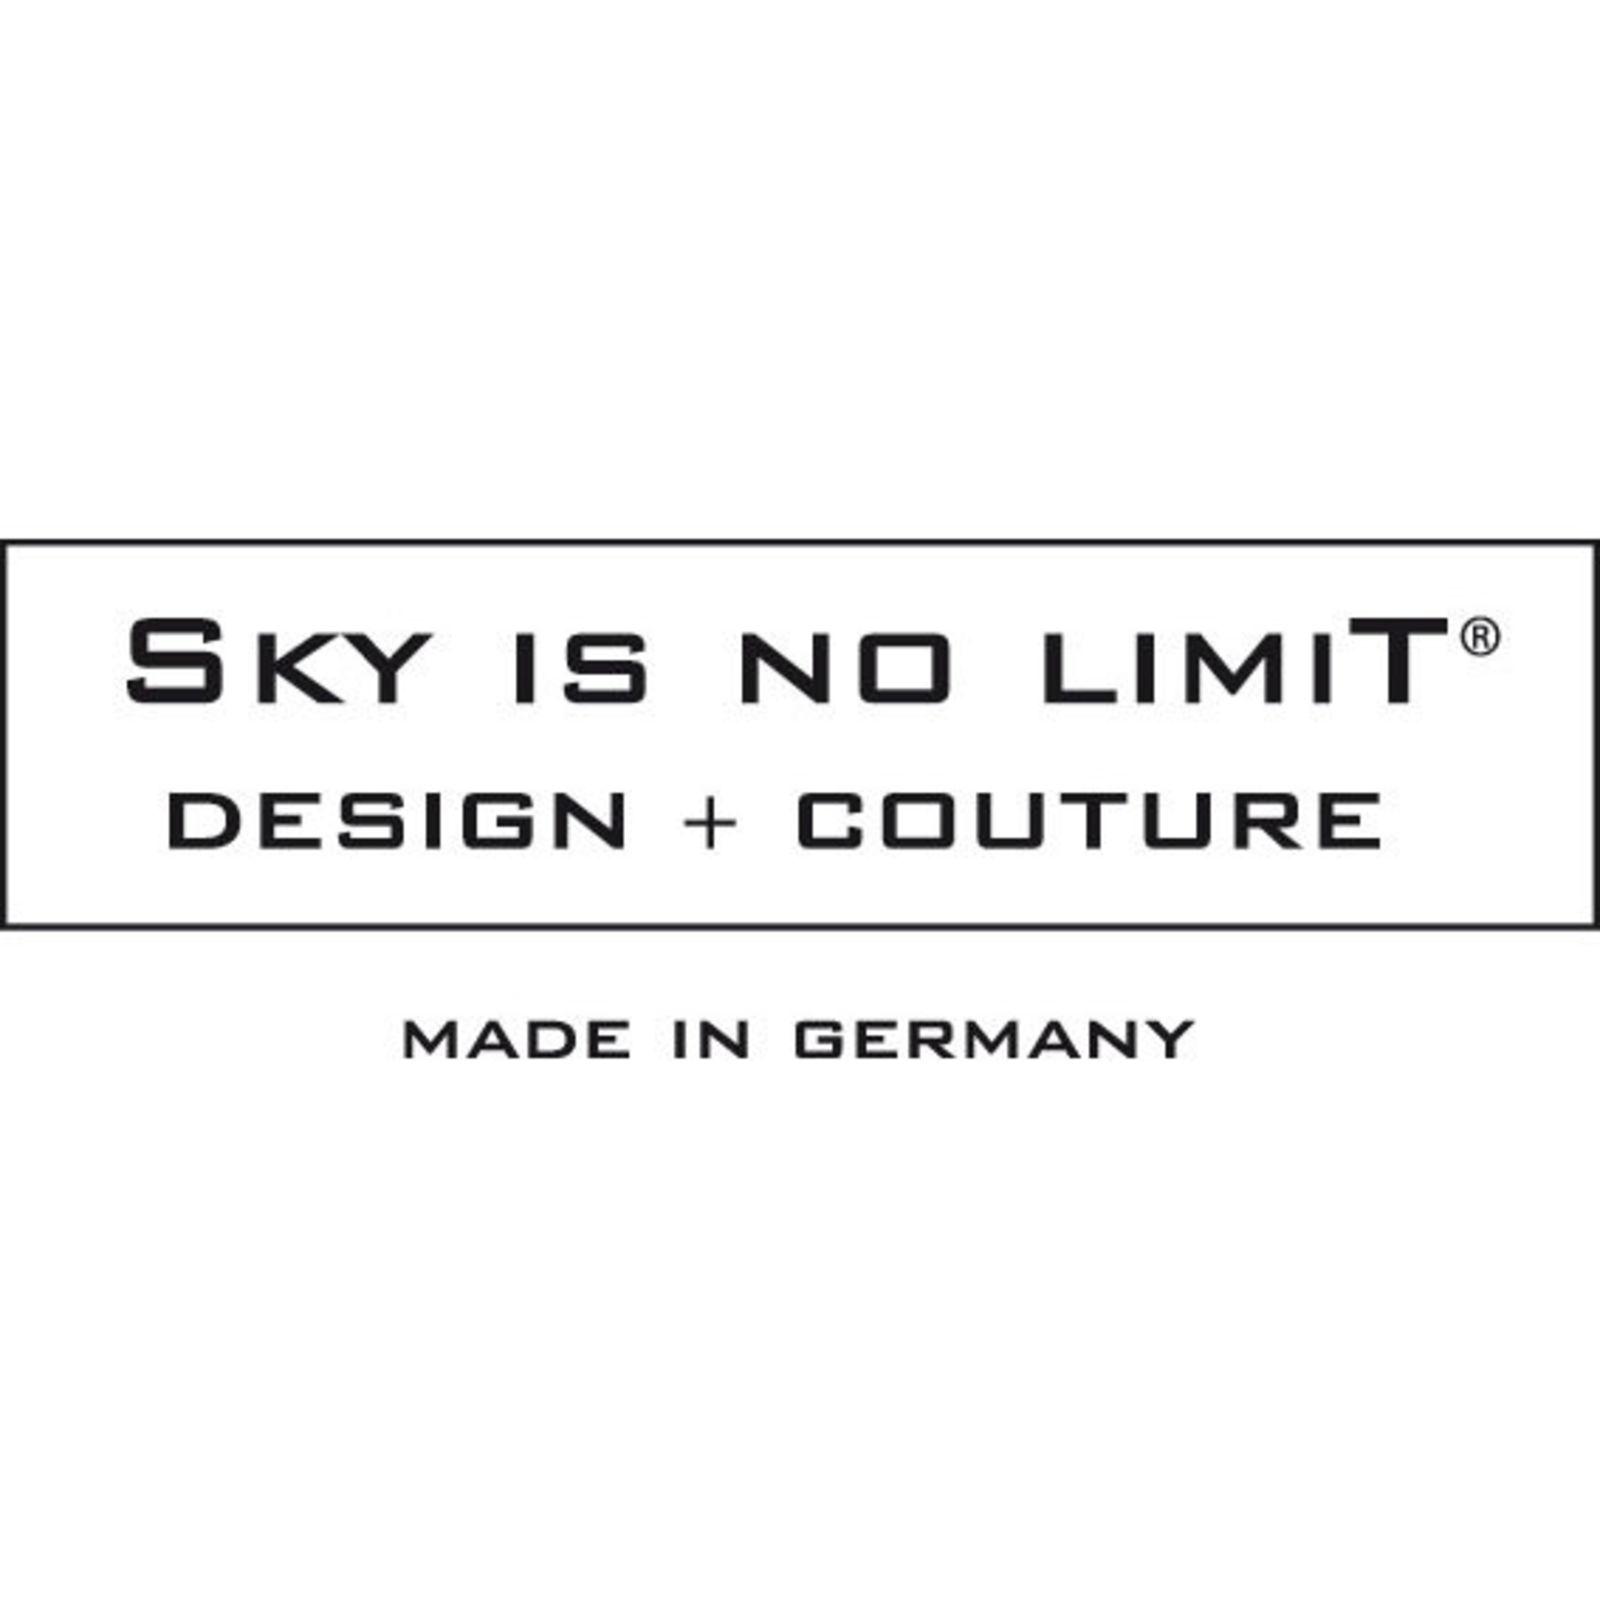 Sky is no limiT